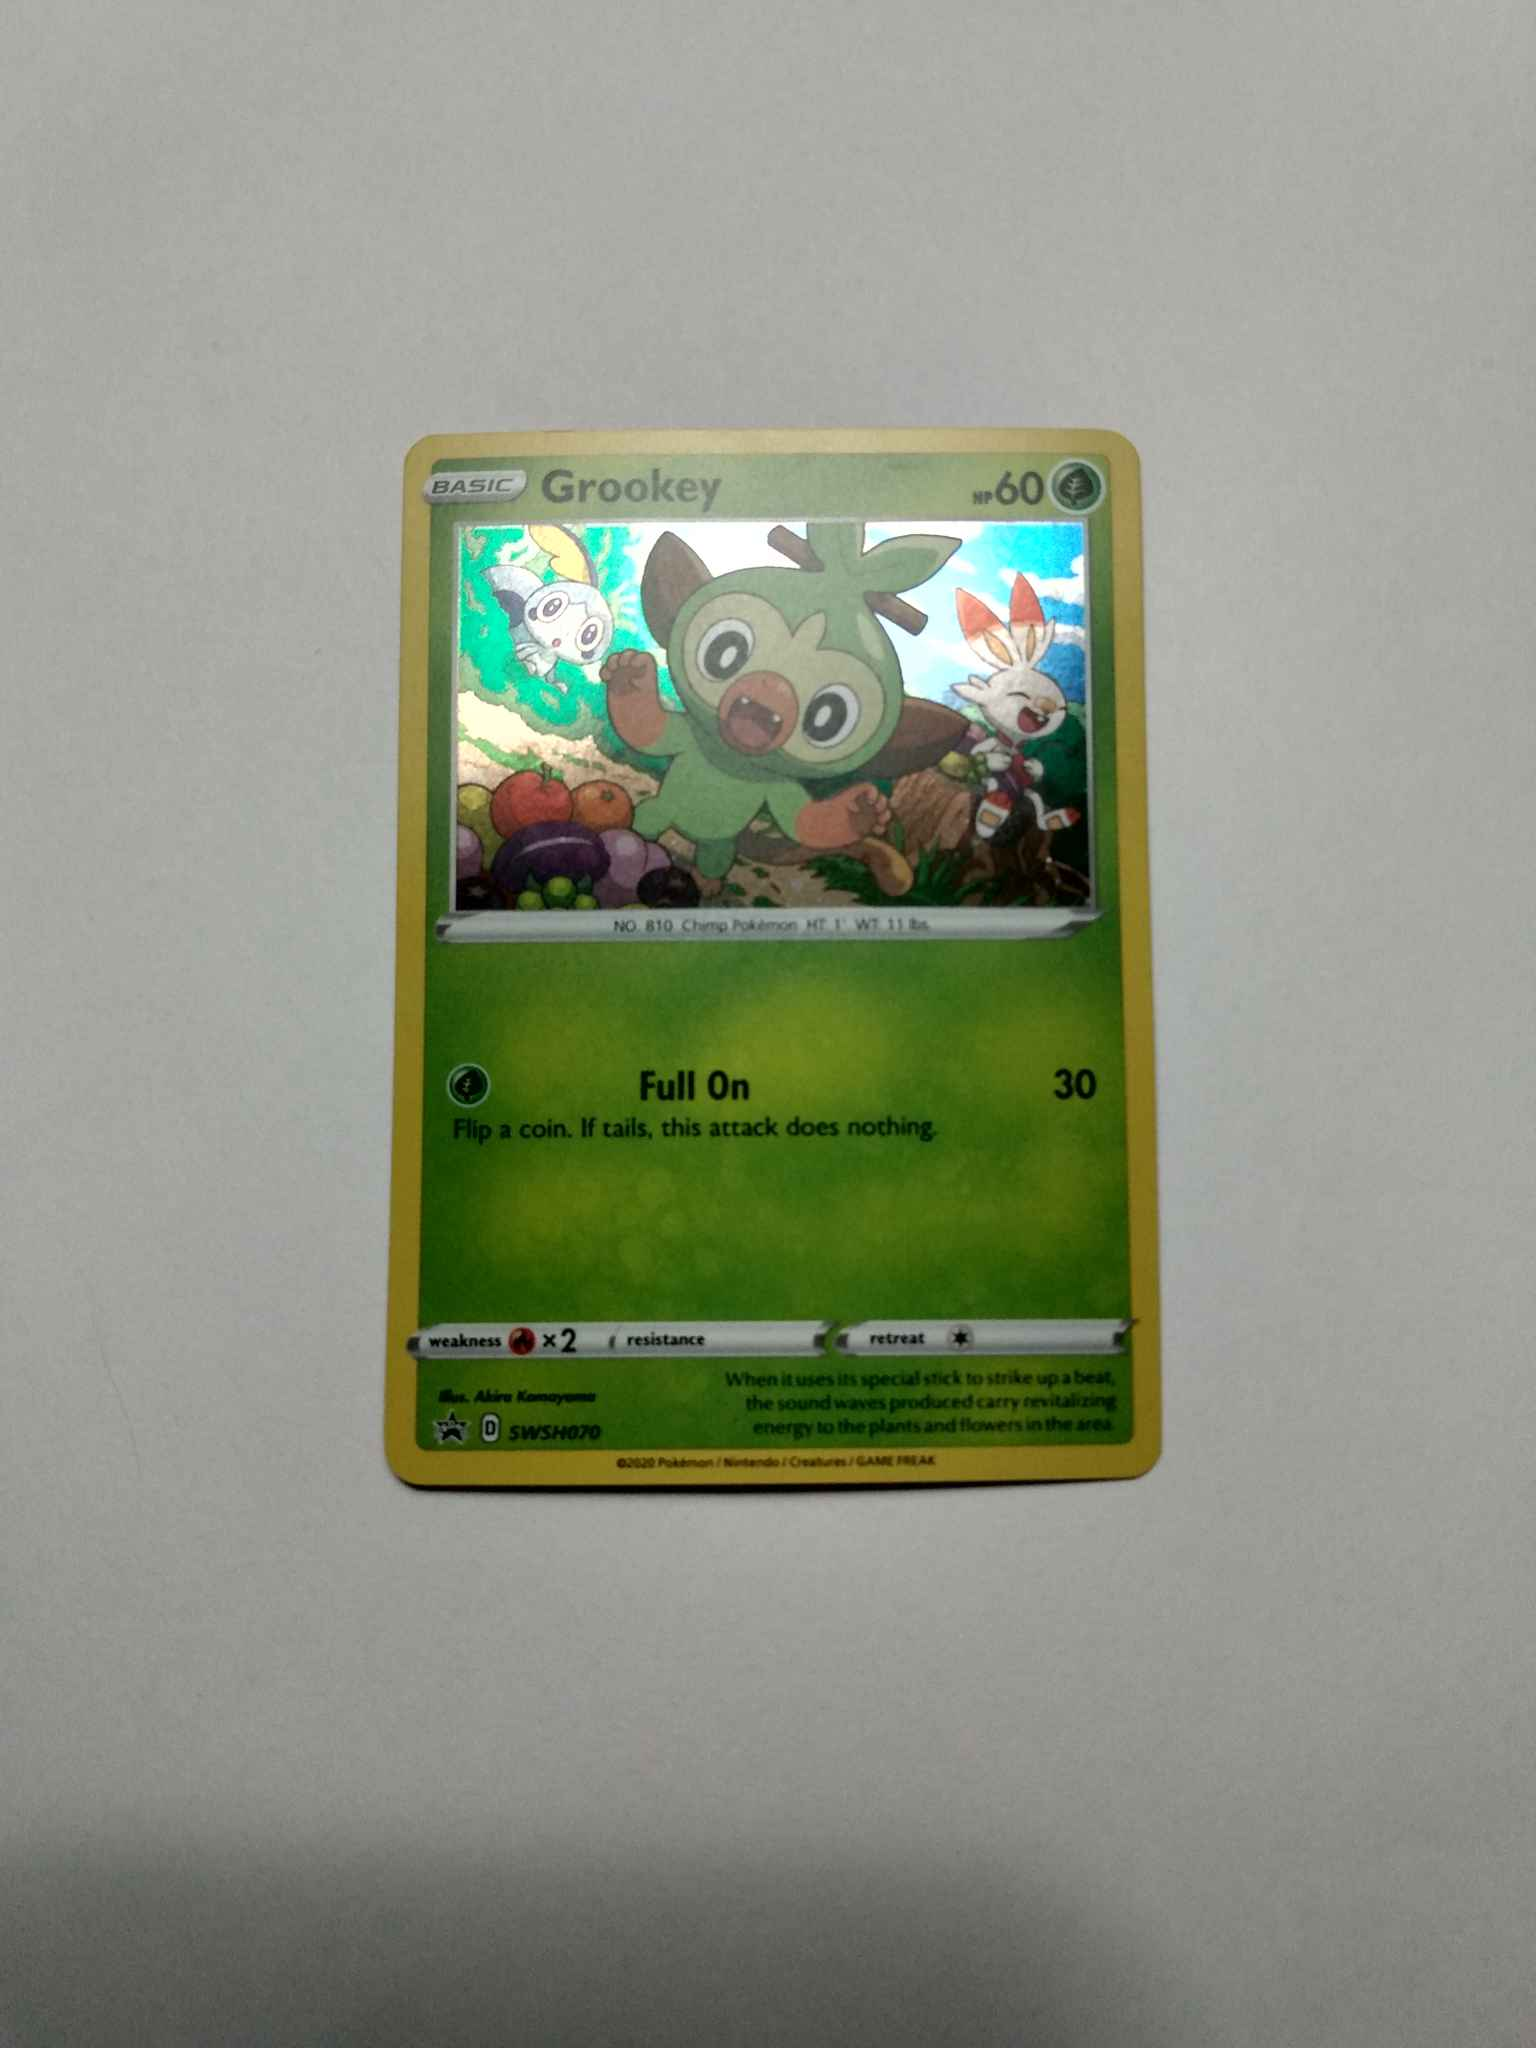 Grookey Swsh070 Grookey Swsh070 Swsh Sword Shield Promo Cards Pokemon Online Gaming Store For Cards Miniatures Singles Packs Booster Boxes Da pokémon central wiki, l'enciclopedia pokémon in italiano. grookey swsh070